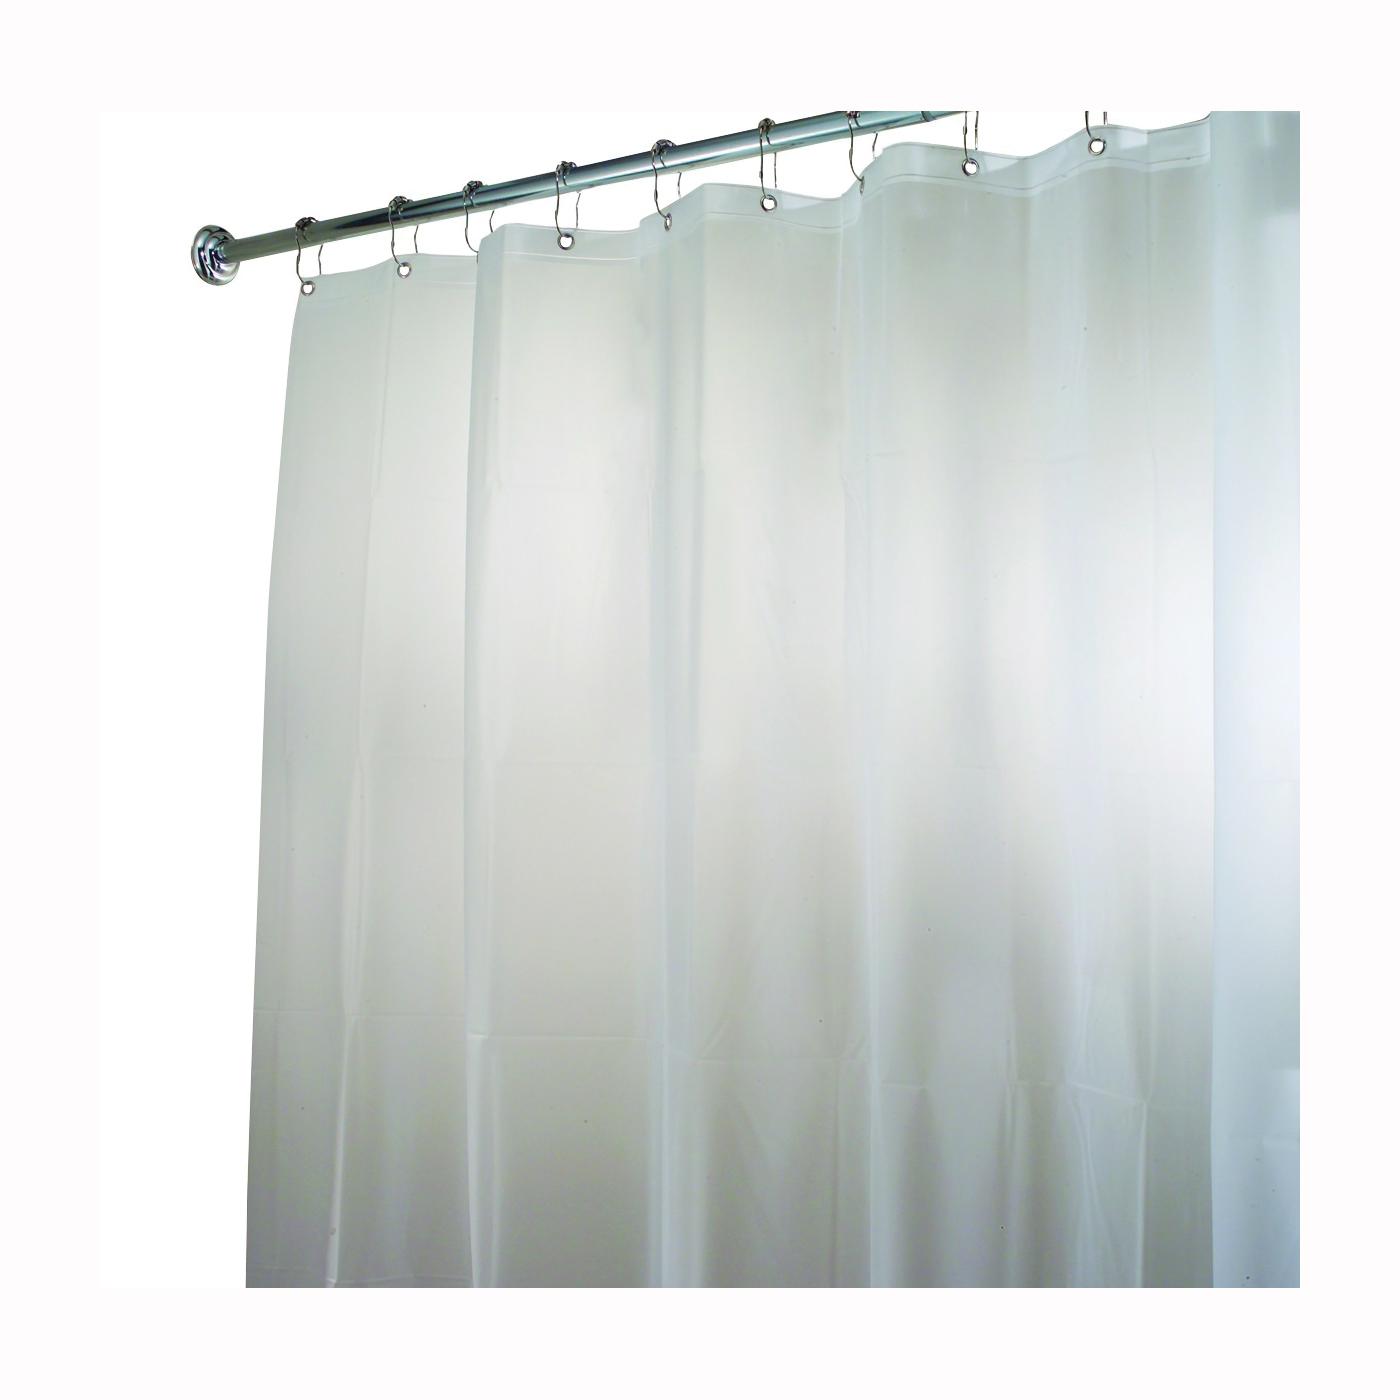 Picture of iDESIGN 14752 Shower Curtain/Liner, 72 in L, 72 in W, EVA Foam, White